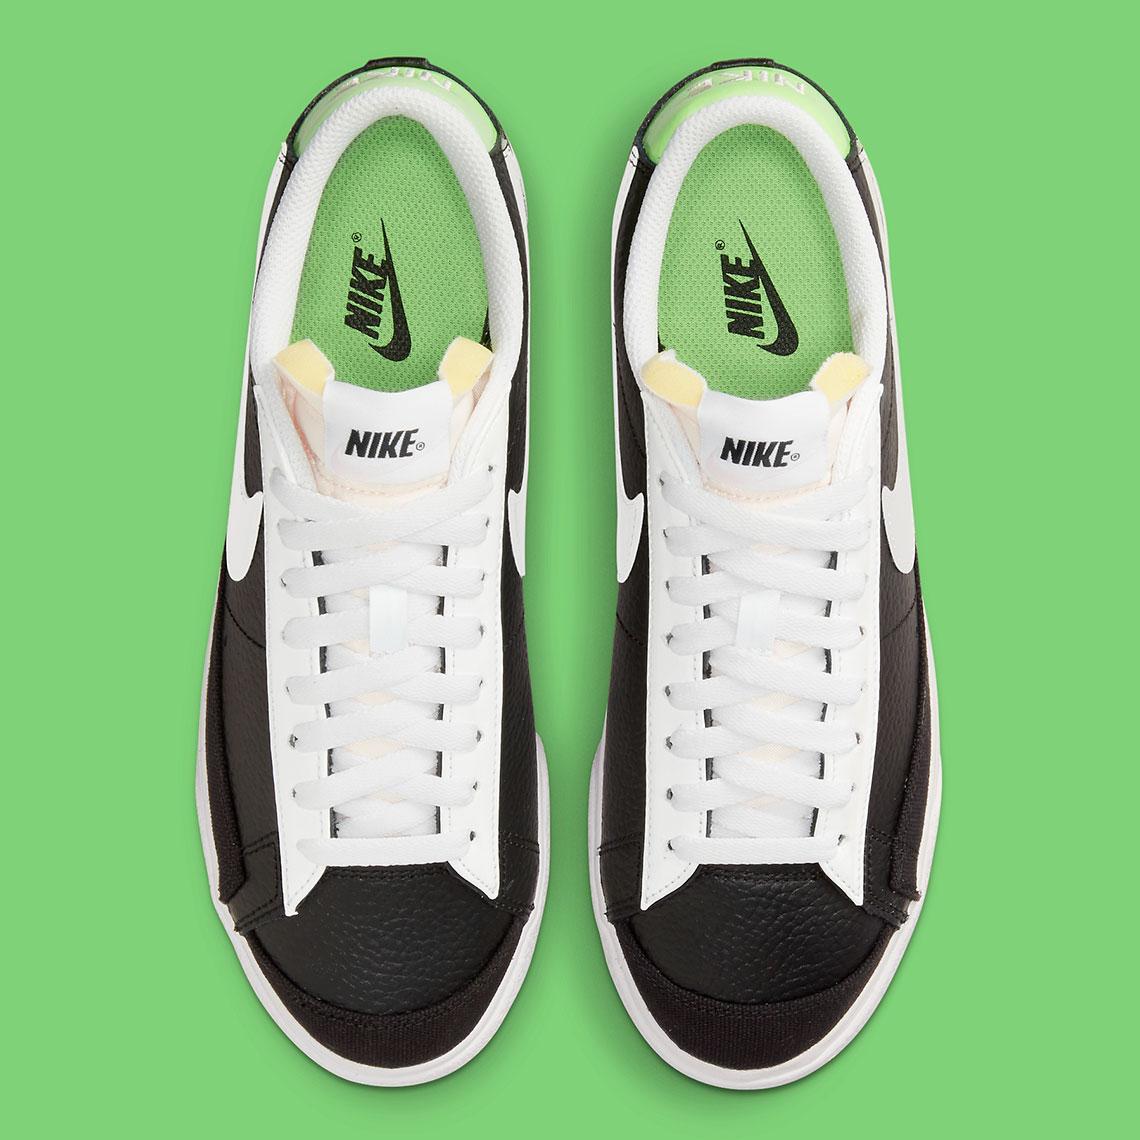 nike blazer low black silver metallic green dn8010 001 7